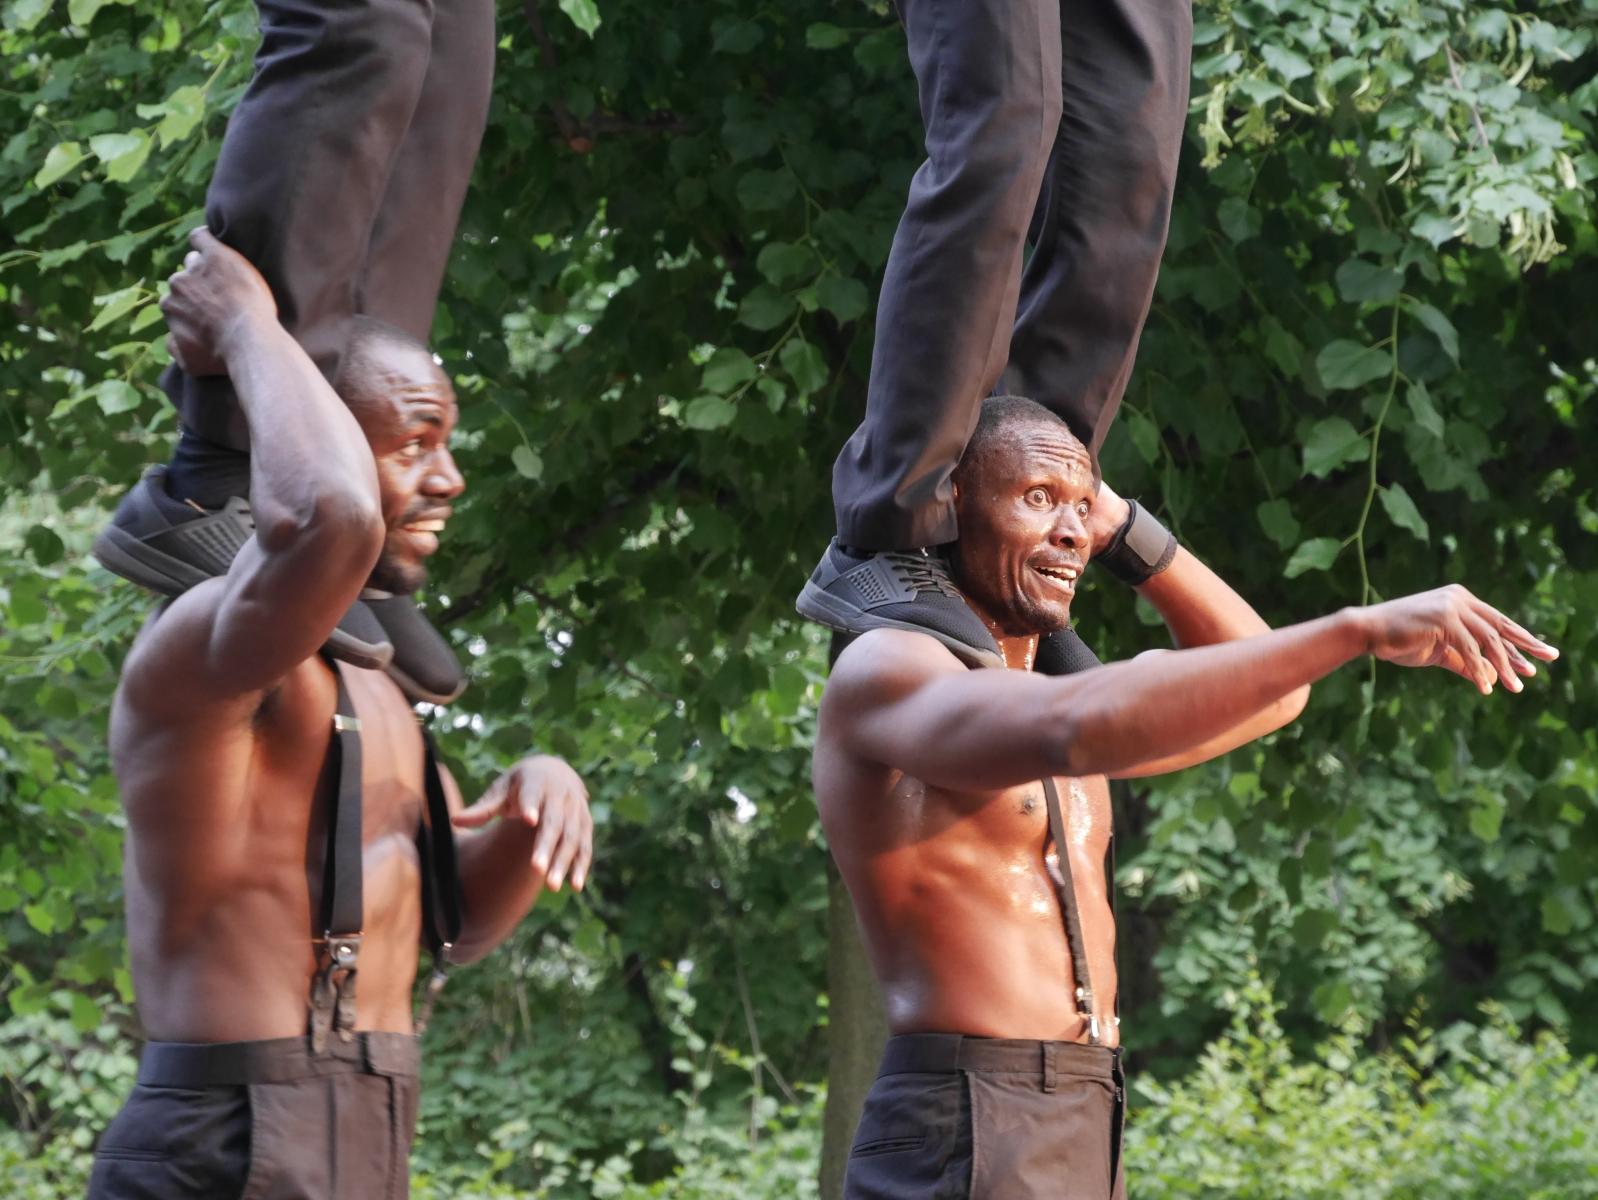 'men in black', Akrobatik auf hohem Niveau